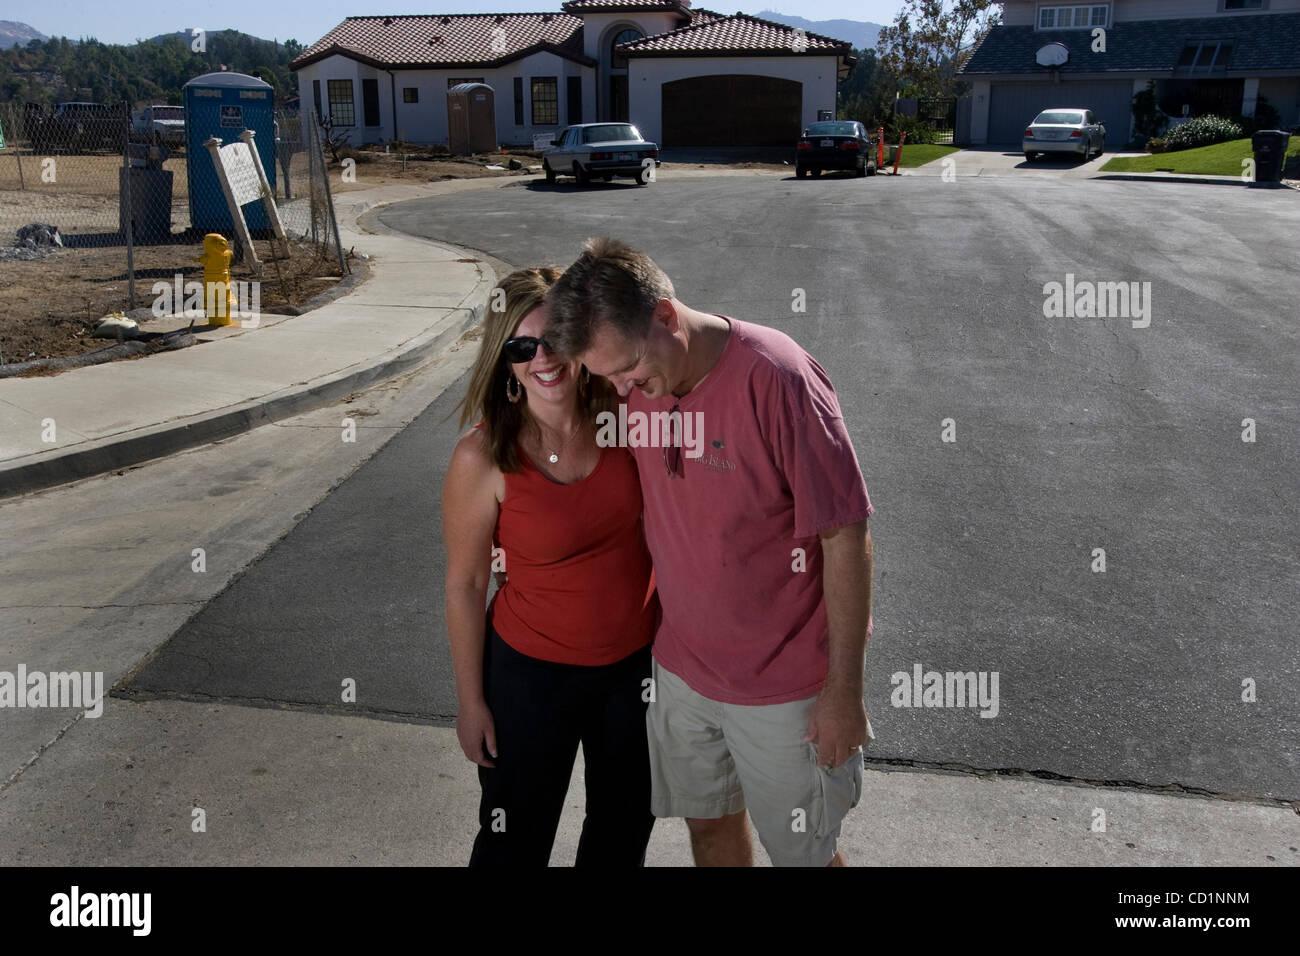 OCTOBER 18, 2008, SAN DIEGO, CALIFORNIA, USA ..................  LYNN GORDON and her husband CRAIG GORDON stand - Stock Image